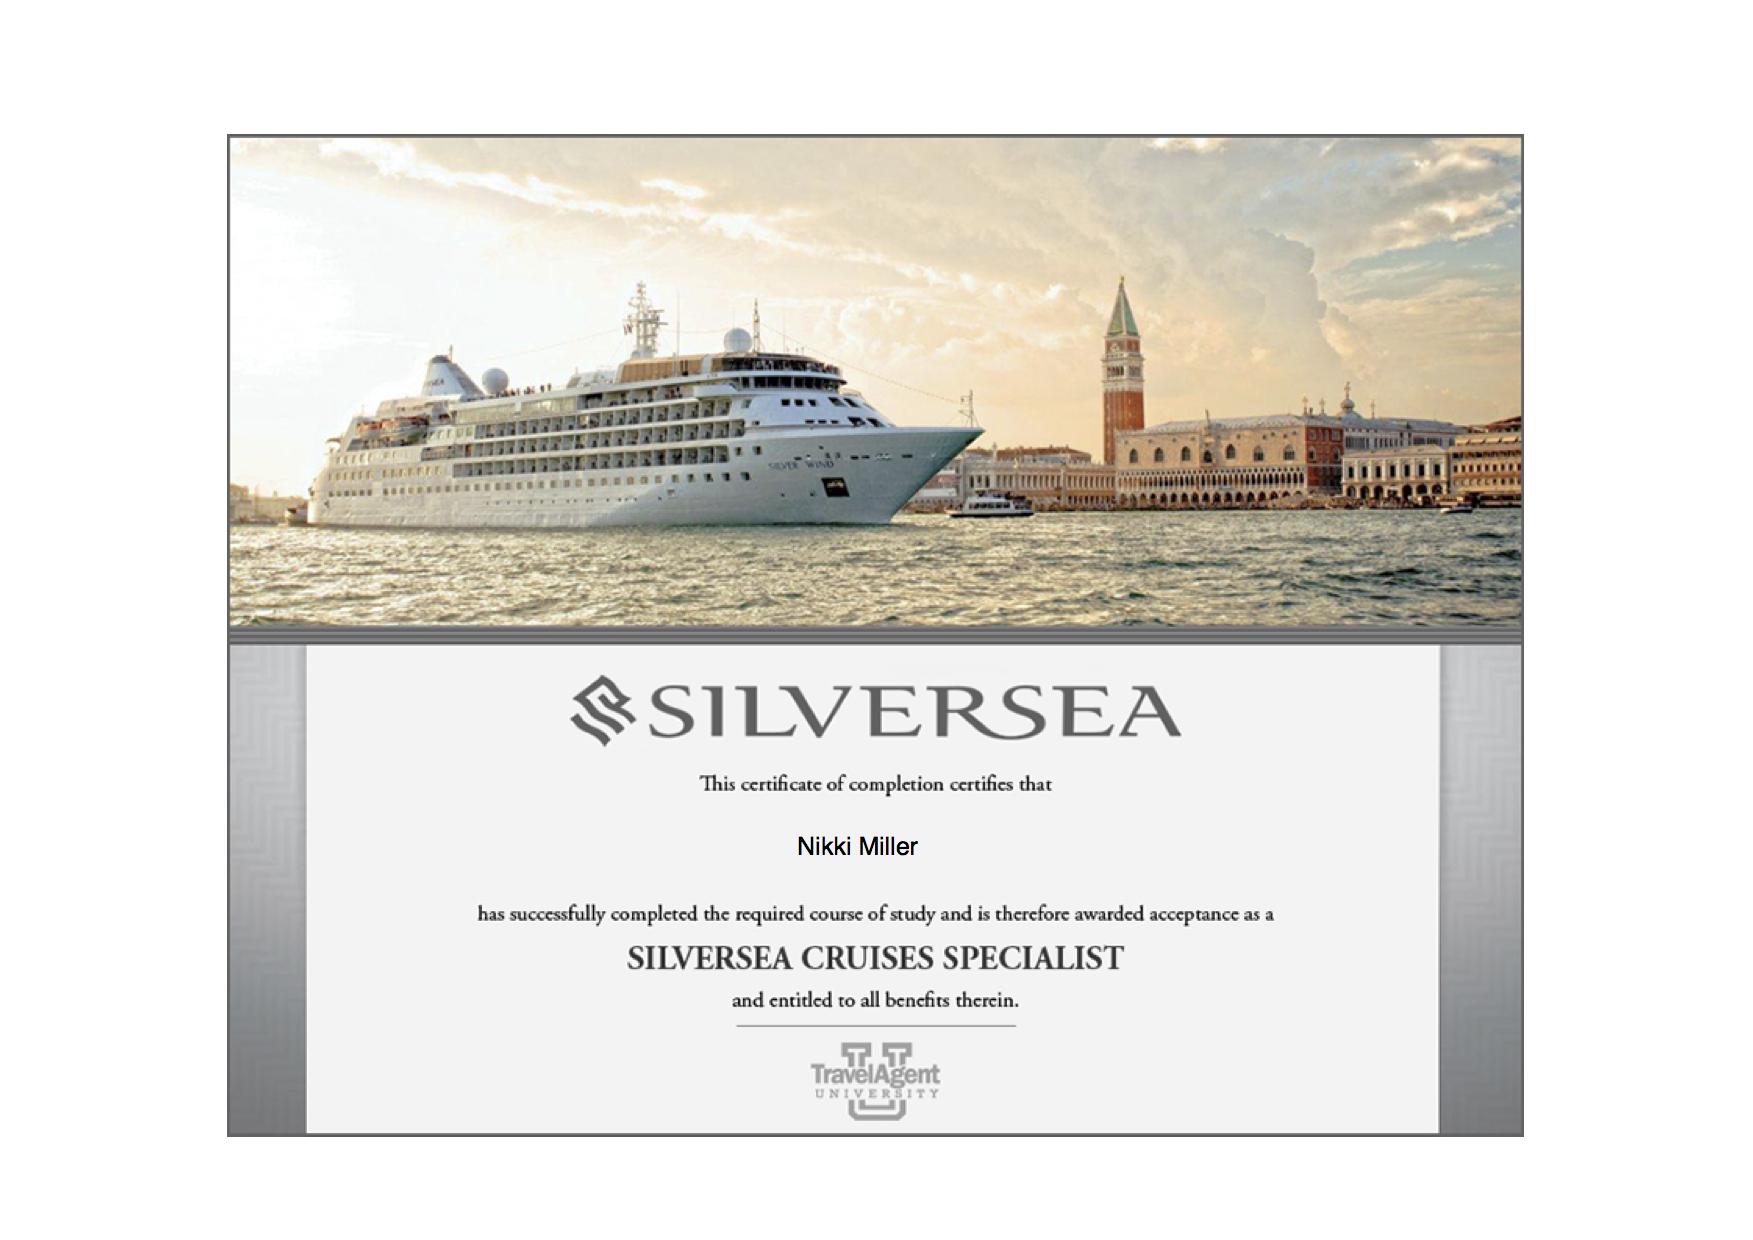 Silversea Specialist - Silversea Diploma - 2014-04-03.png